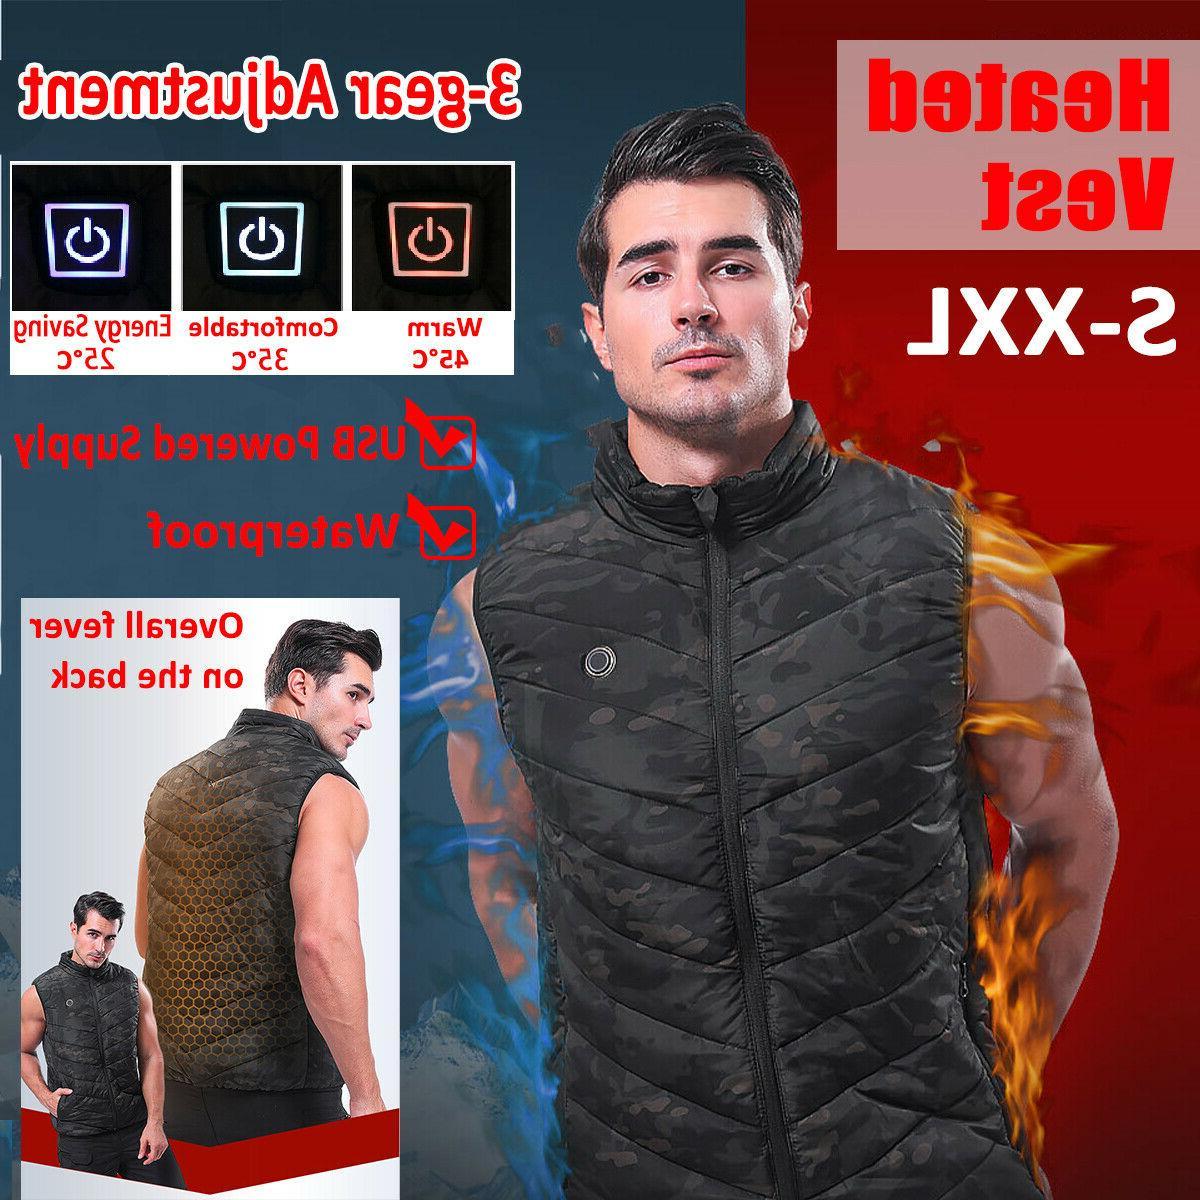 Men Womens Vest Heated Jacket USB Warm Up Heating Body